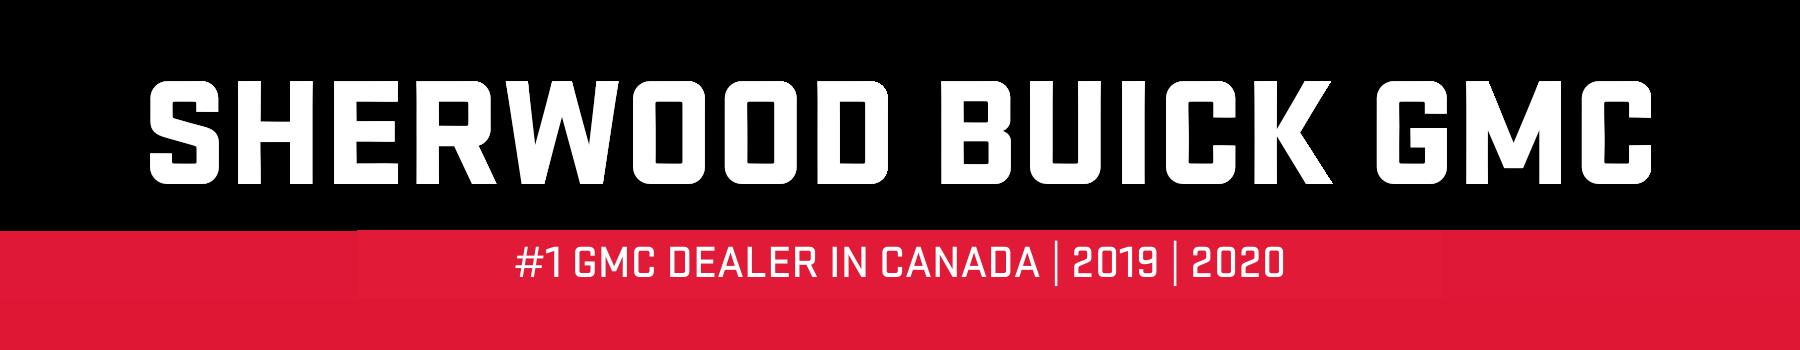 #1 GMC Dealer in Canada